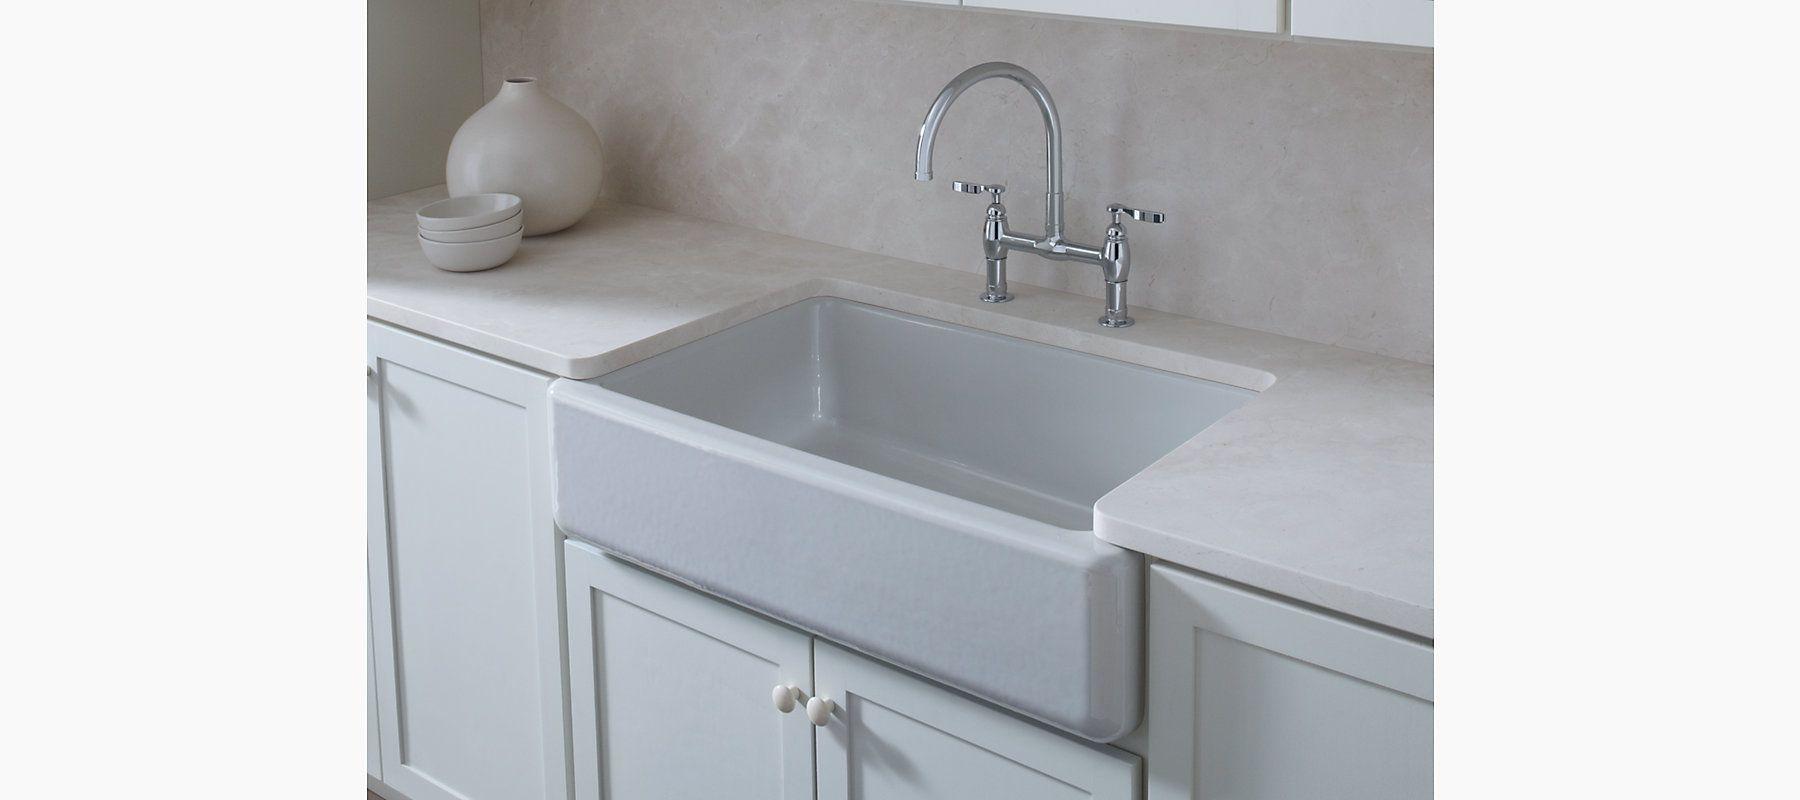 The classic beauty of the K-6489 single-basin, enameled cast iron ...